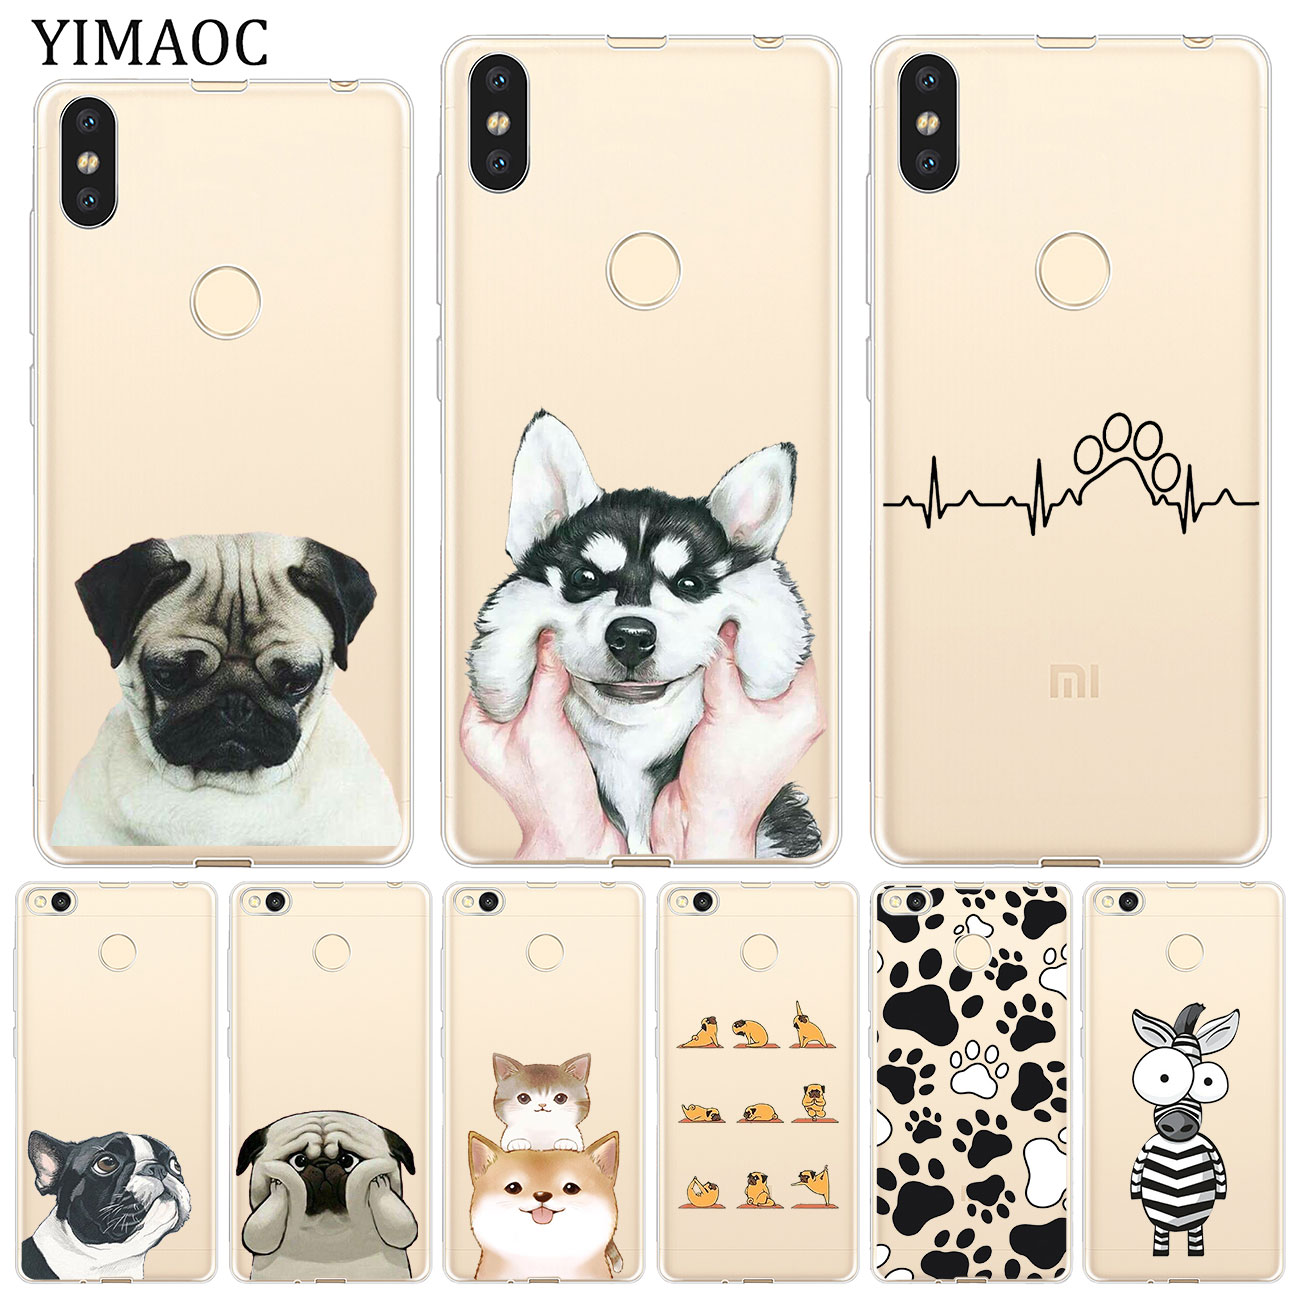 YIMAOC dog Paw Husky pug  corgi Soft Case for Xiaomi Mi 9 9T CC9 CC9E A3 Pro 8 SE A2 Lite A1 MiX 2S